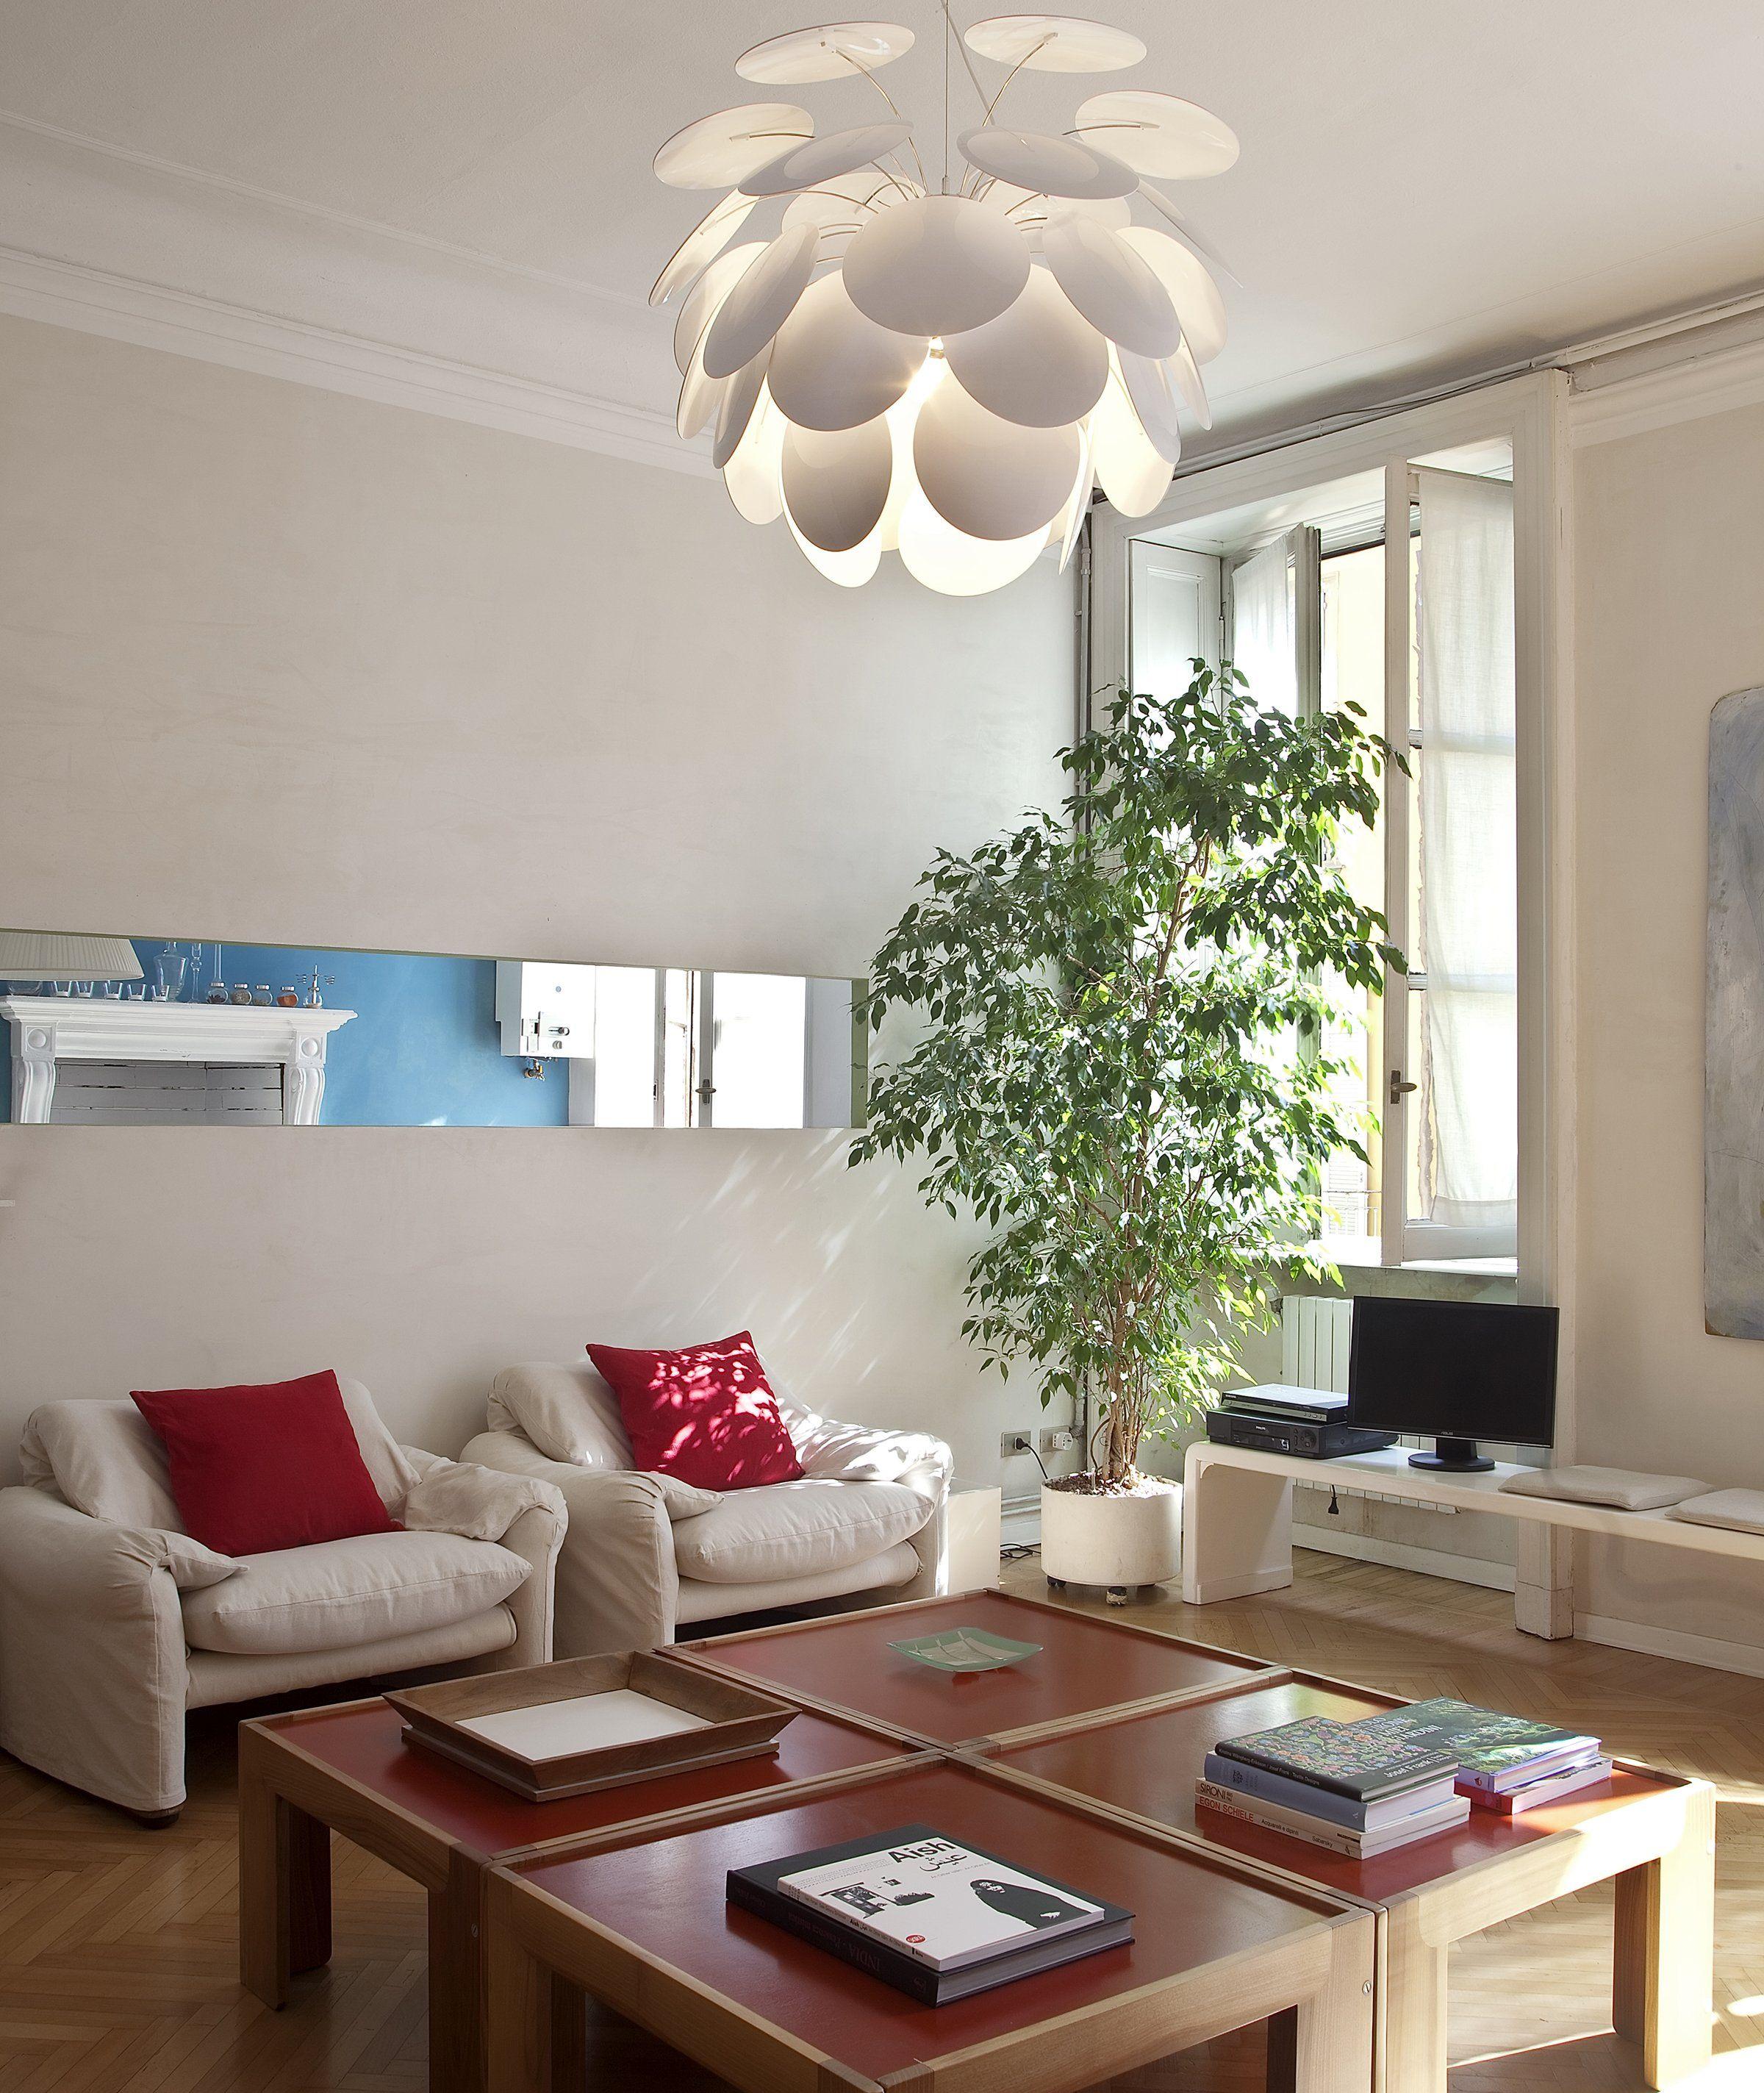 Discoco Pendant Lamp More Options In 2021 House Interior Decor Marset Pendant Lamp